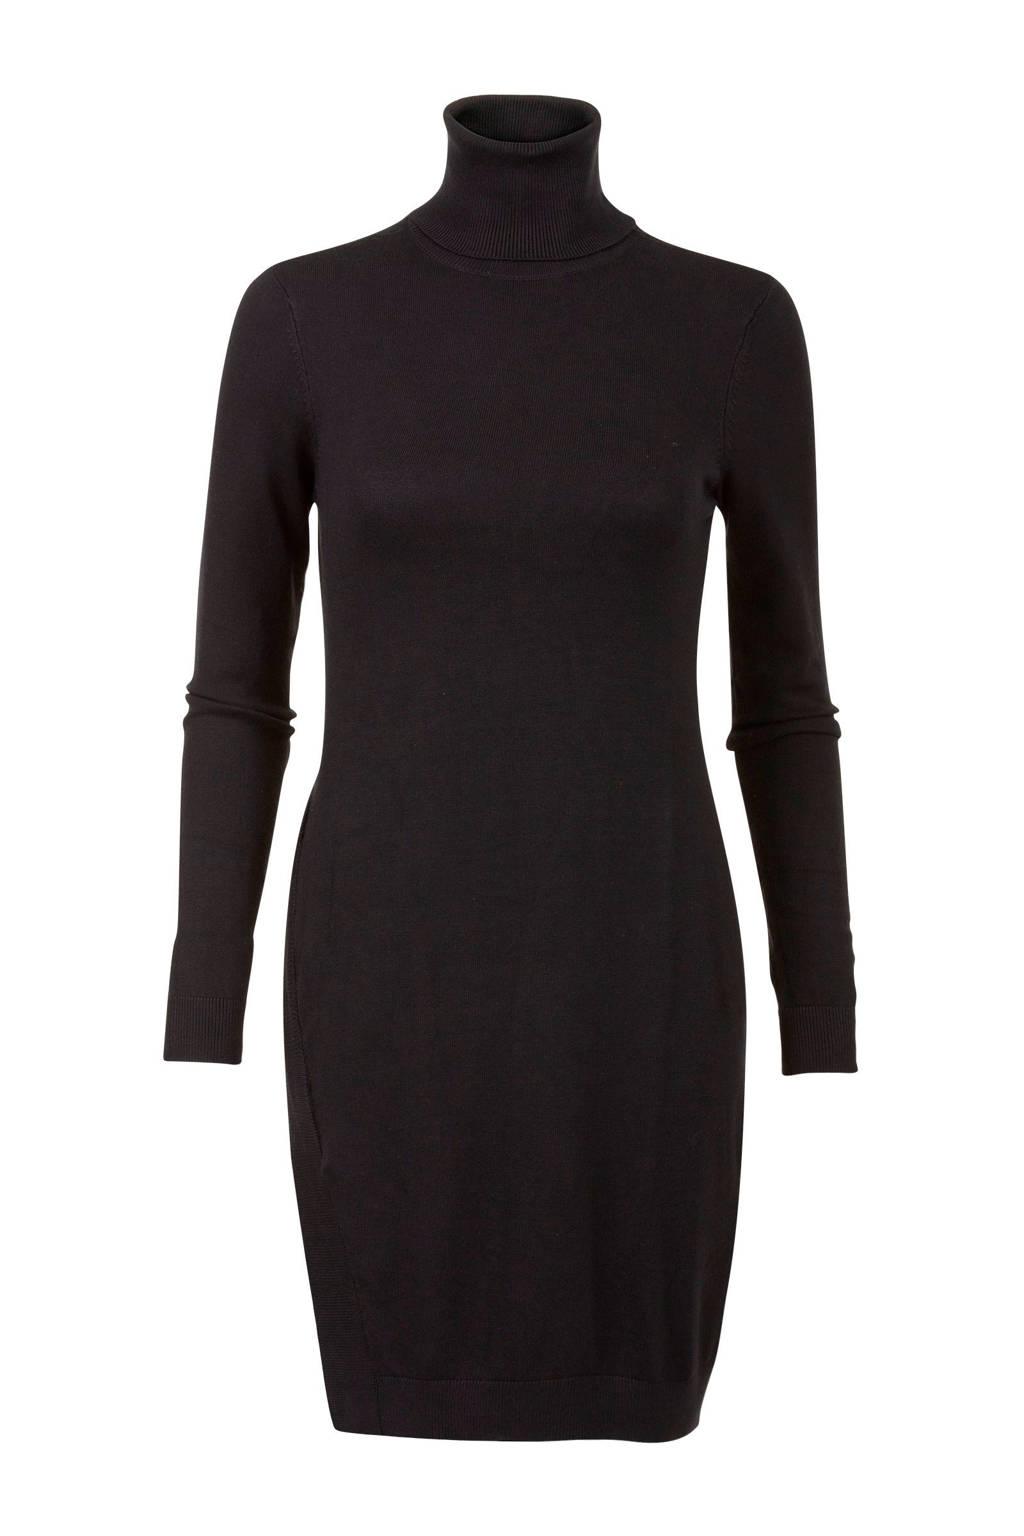 Miss Etam Regulier gebreide jurk met col zwart, Zwart